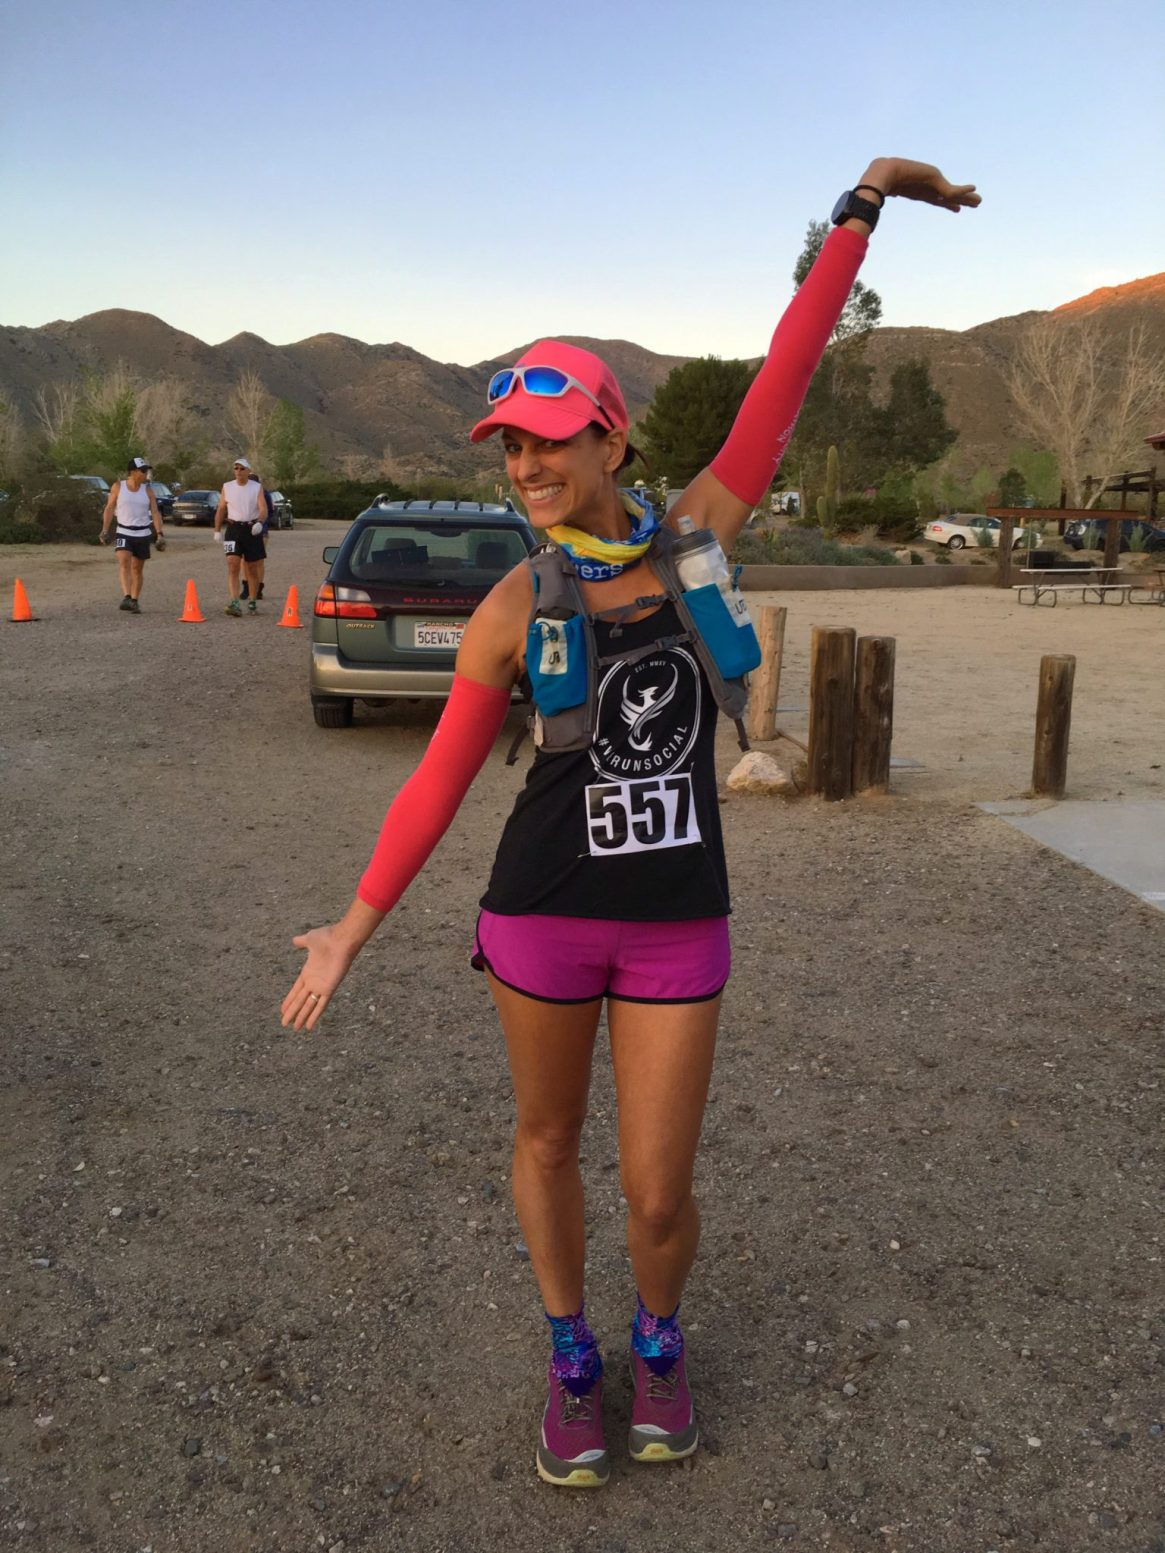 Old West 50k, ultra running, trail run, desert run, we run social, ultimate direction, xx2i, running4thosewhocant